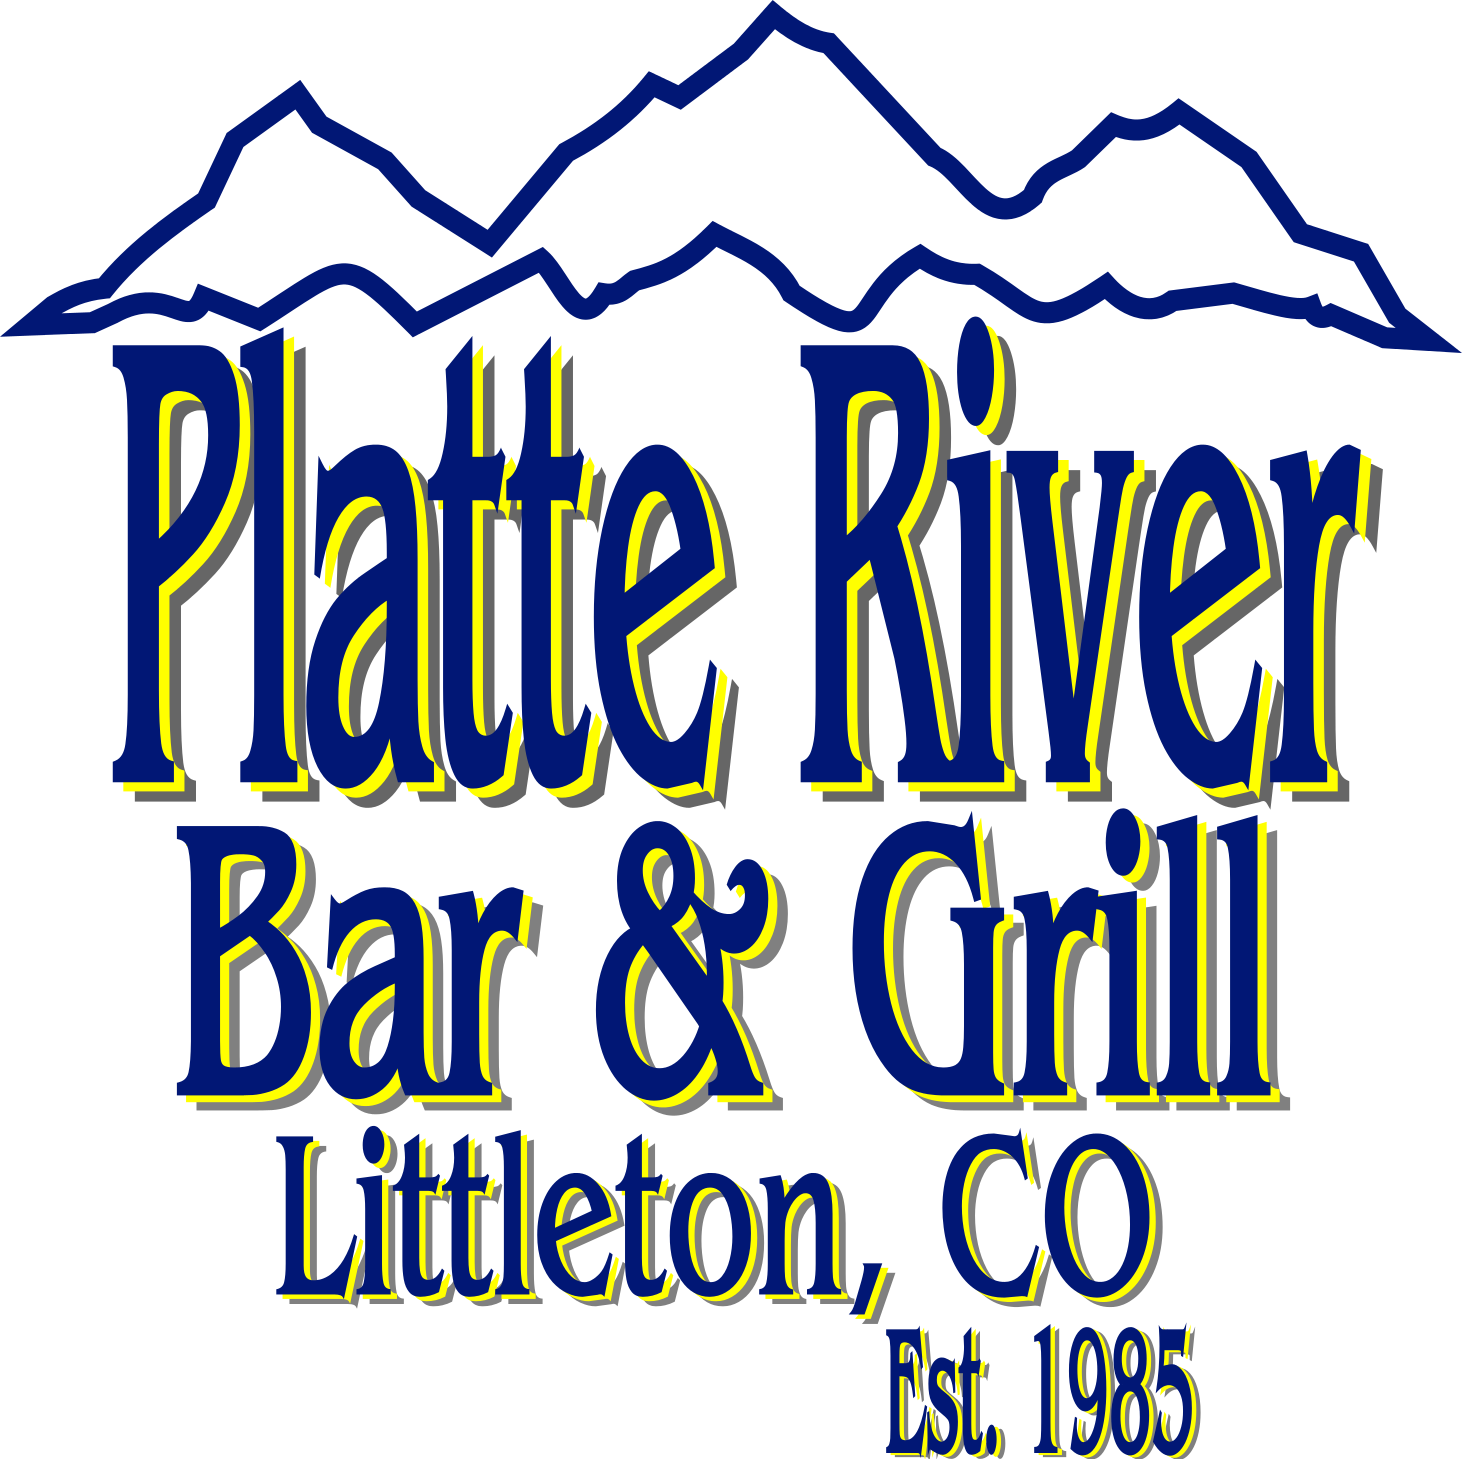 The Platte River Bar & Grill | theplatte